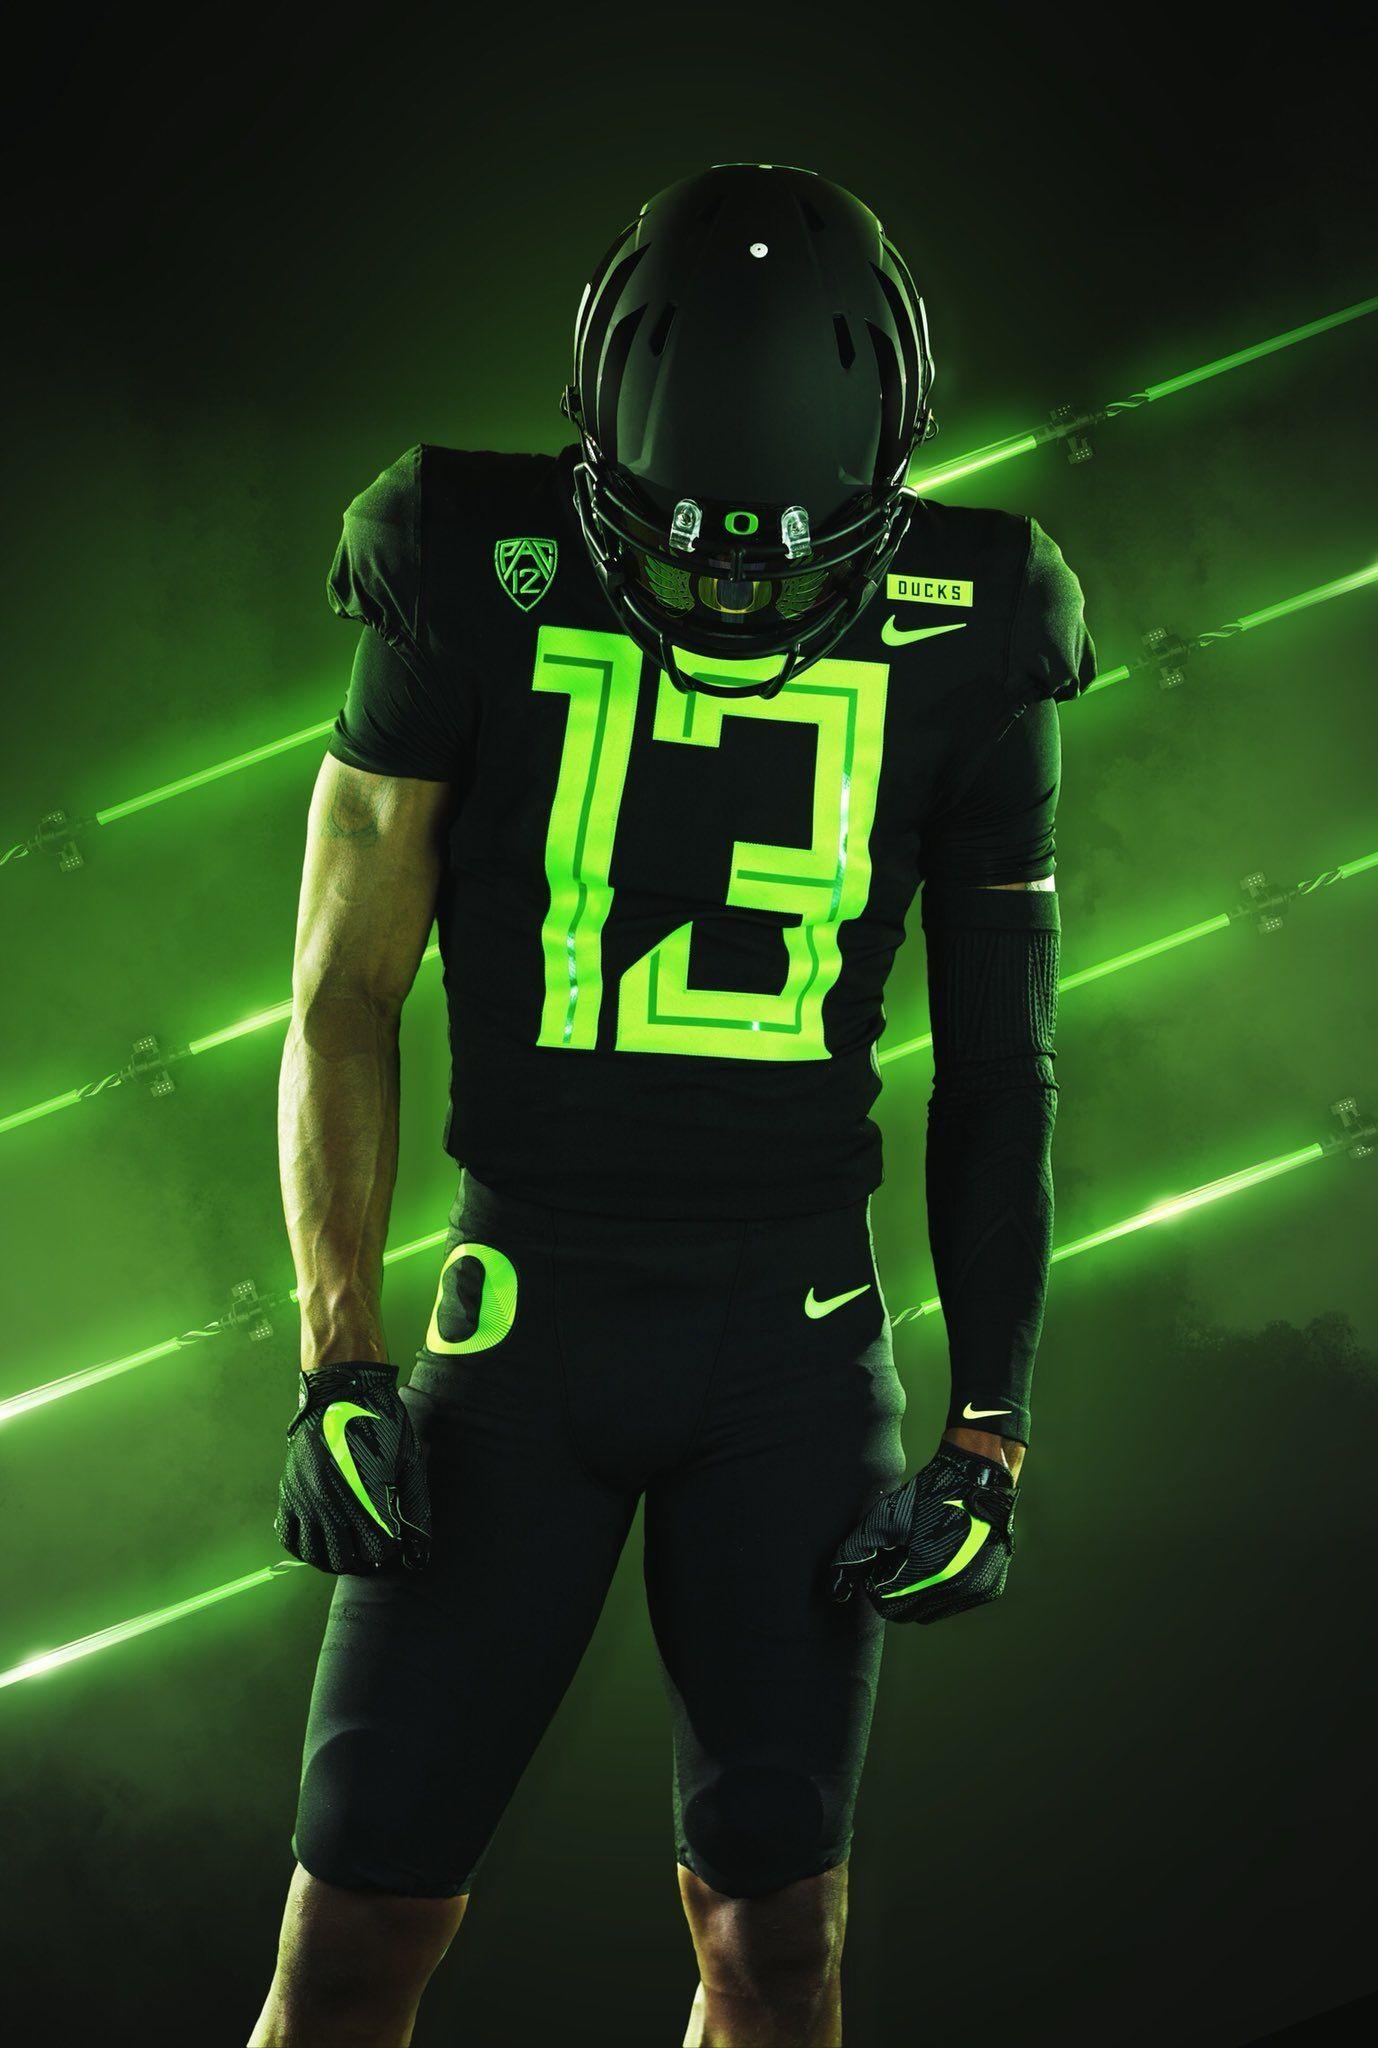 Untitled In 2020 College Football Uniforms Oregon Football Football